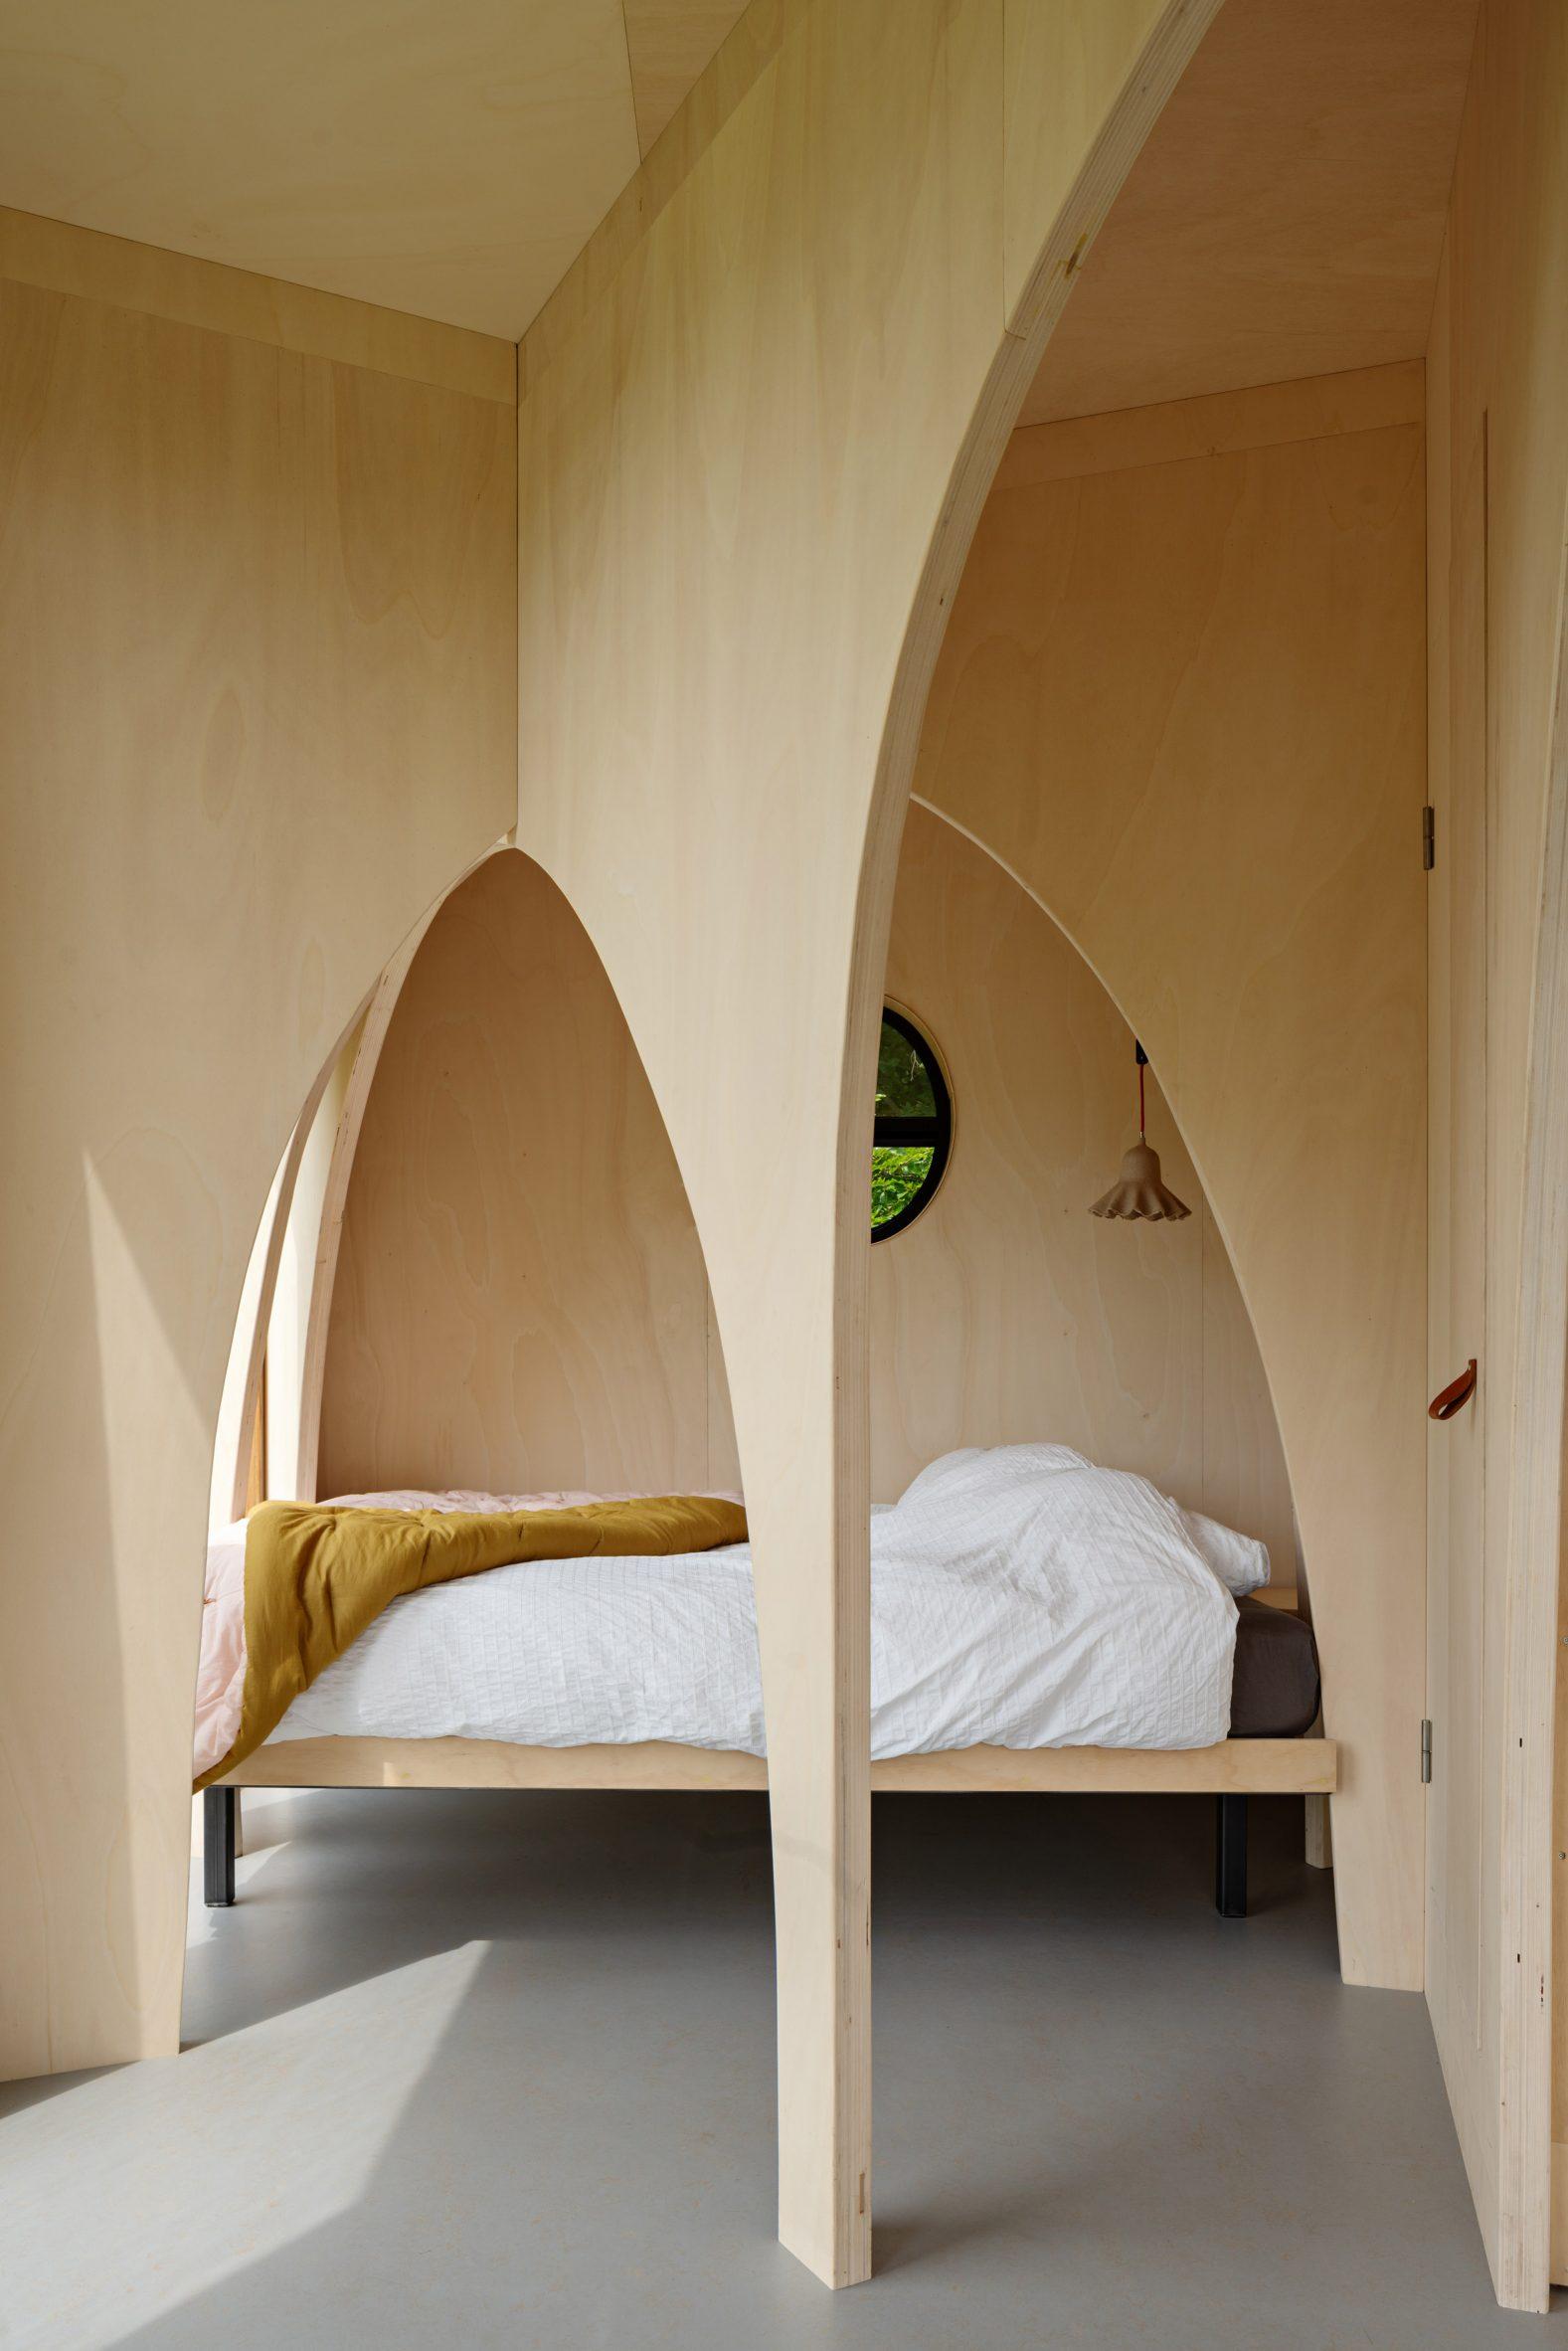 Interior by the way we build